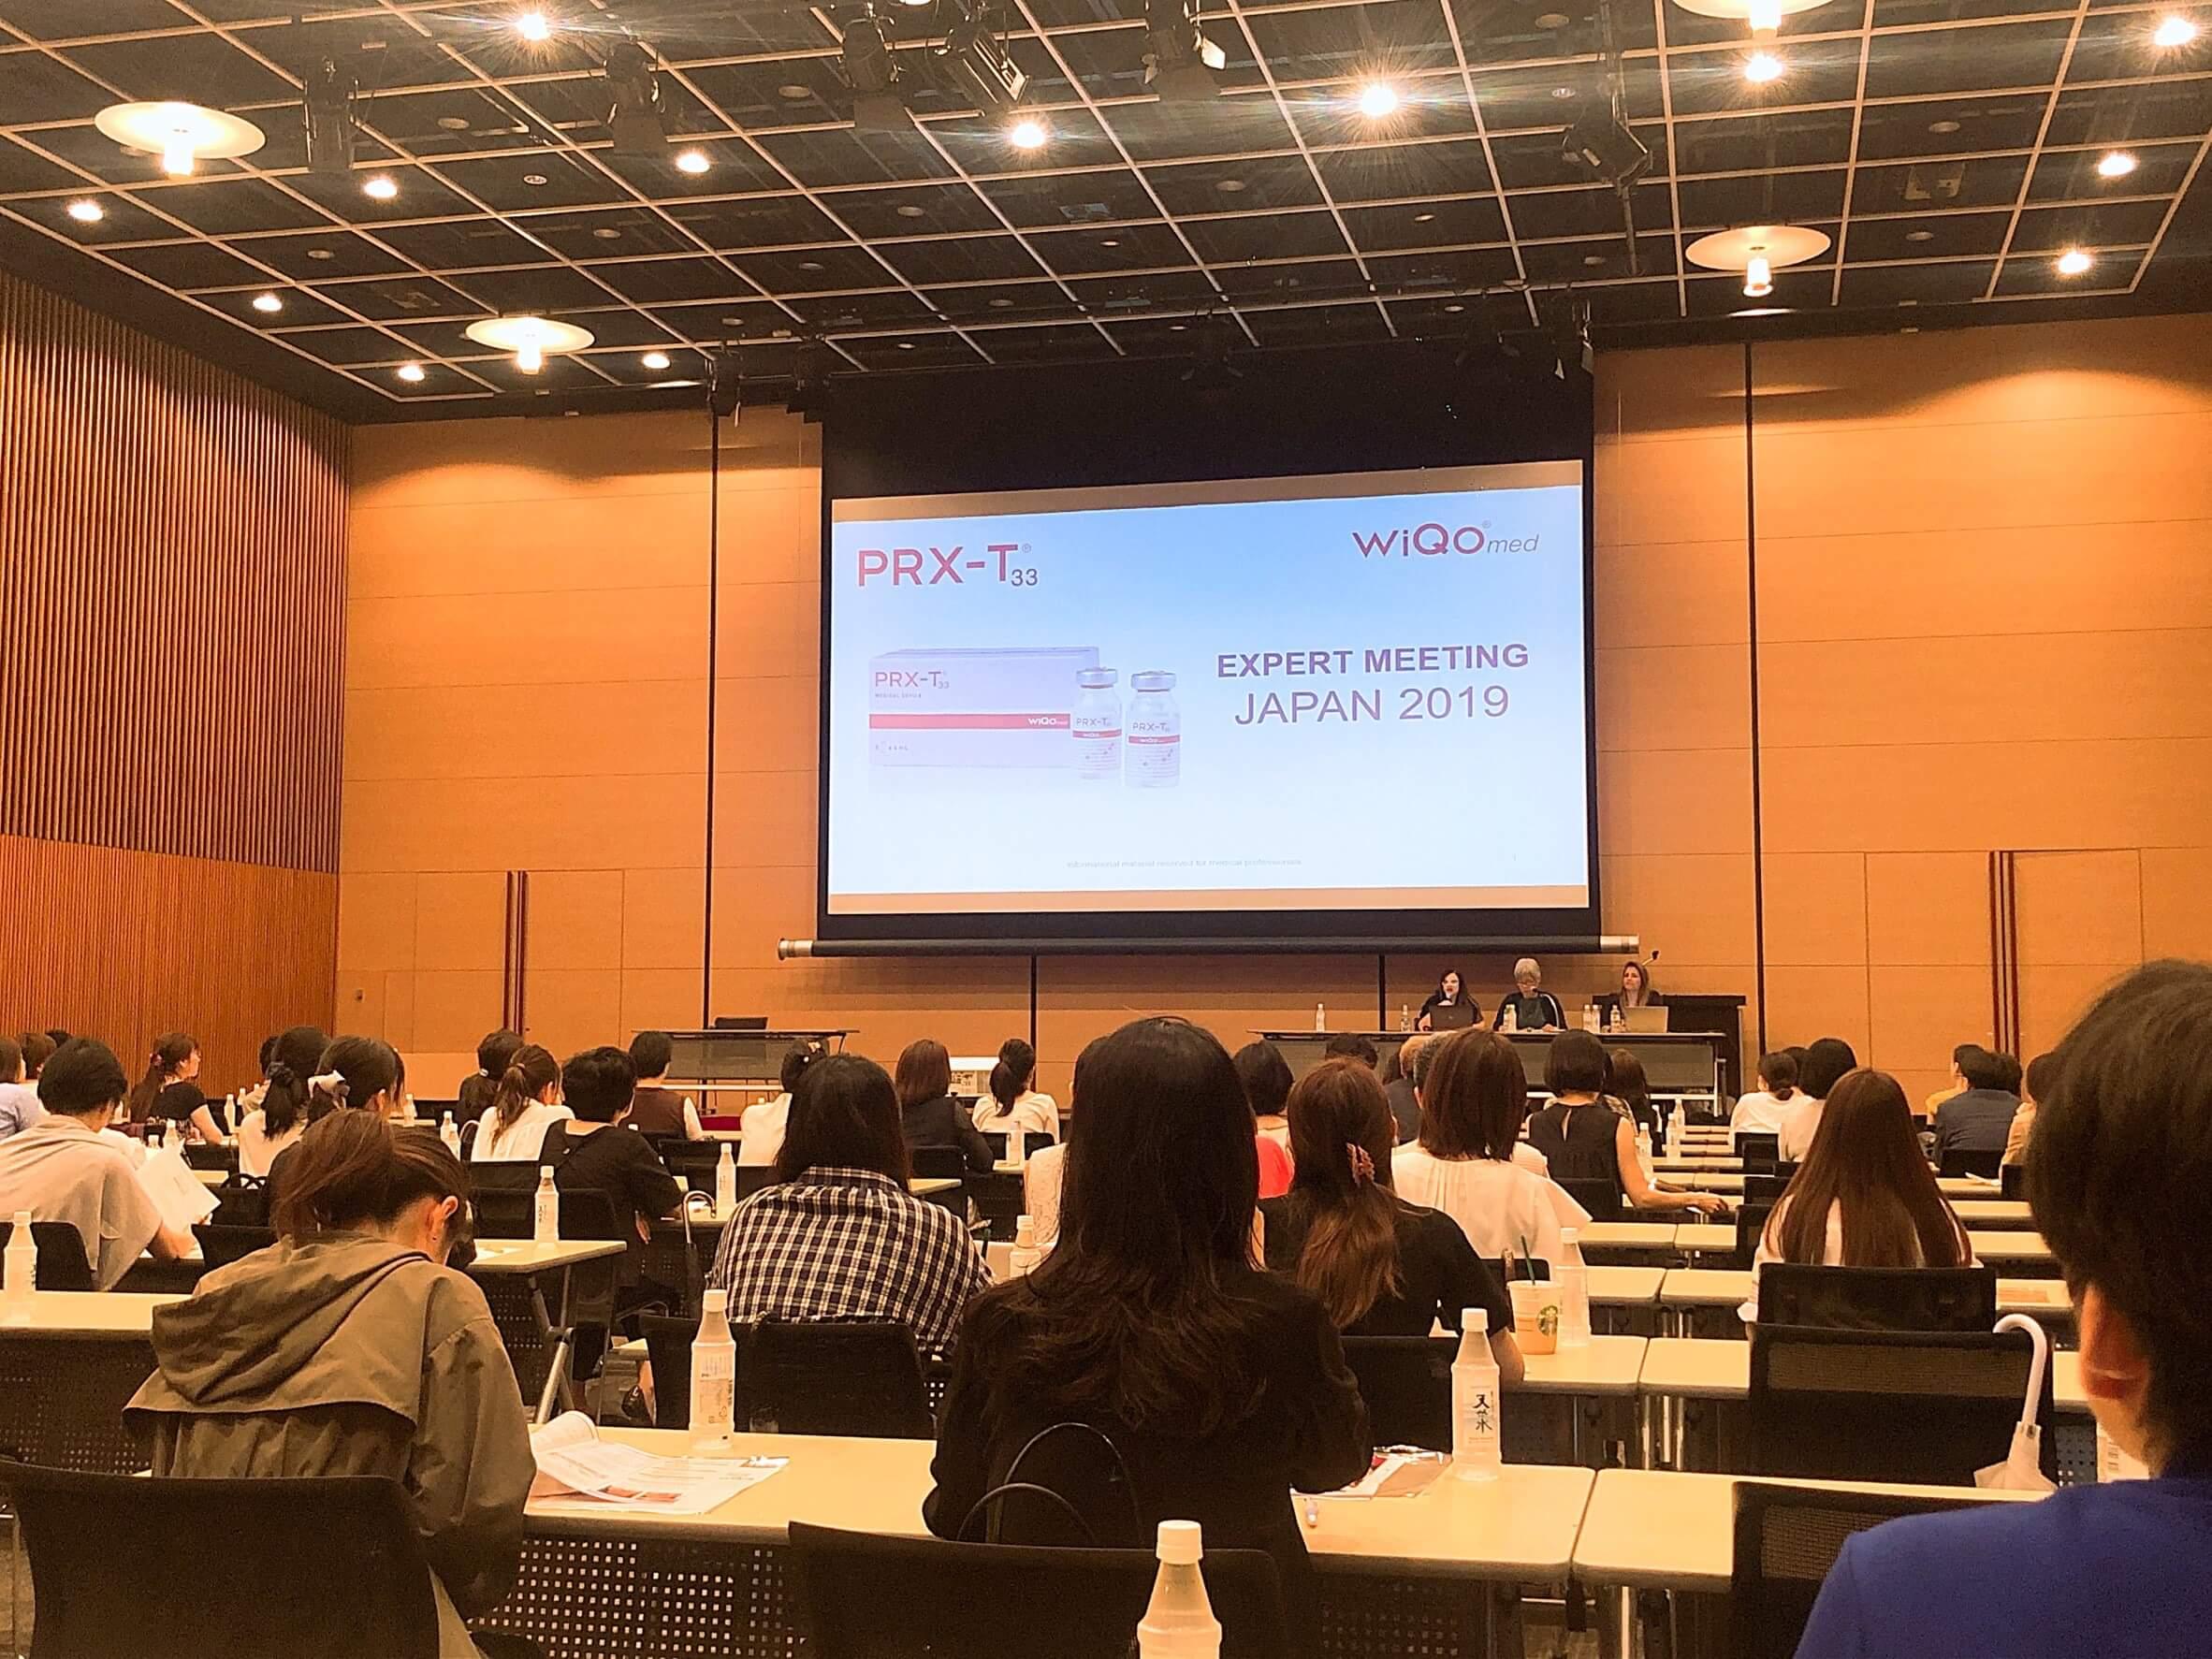 EXPERT MEETING JAPAN 2019